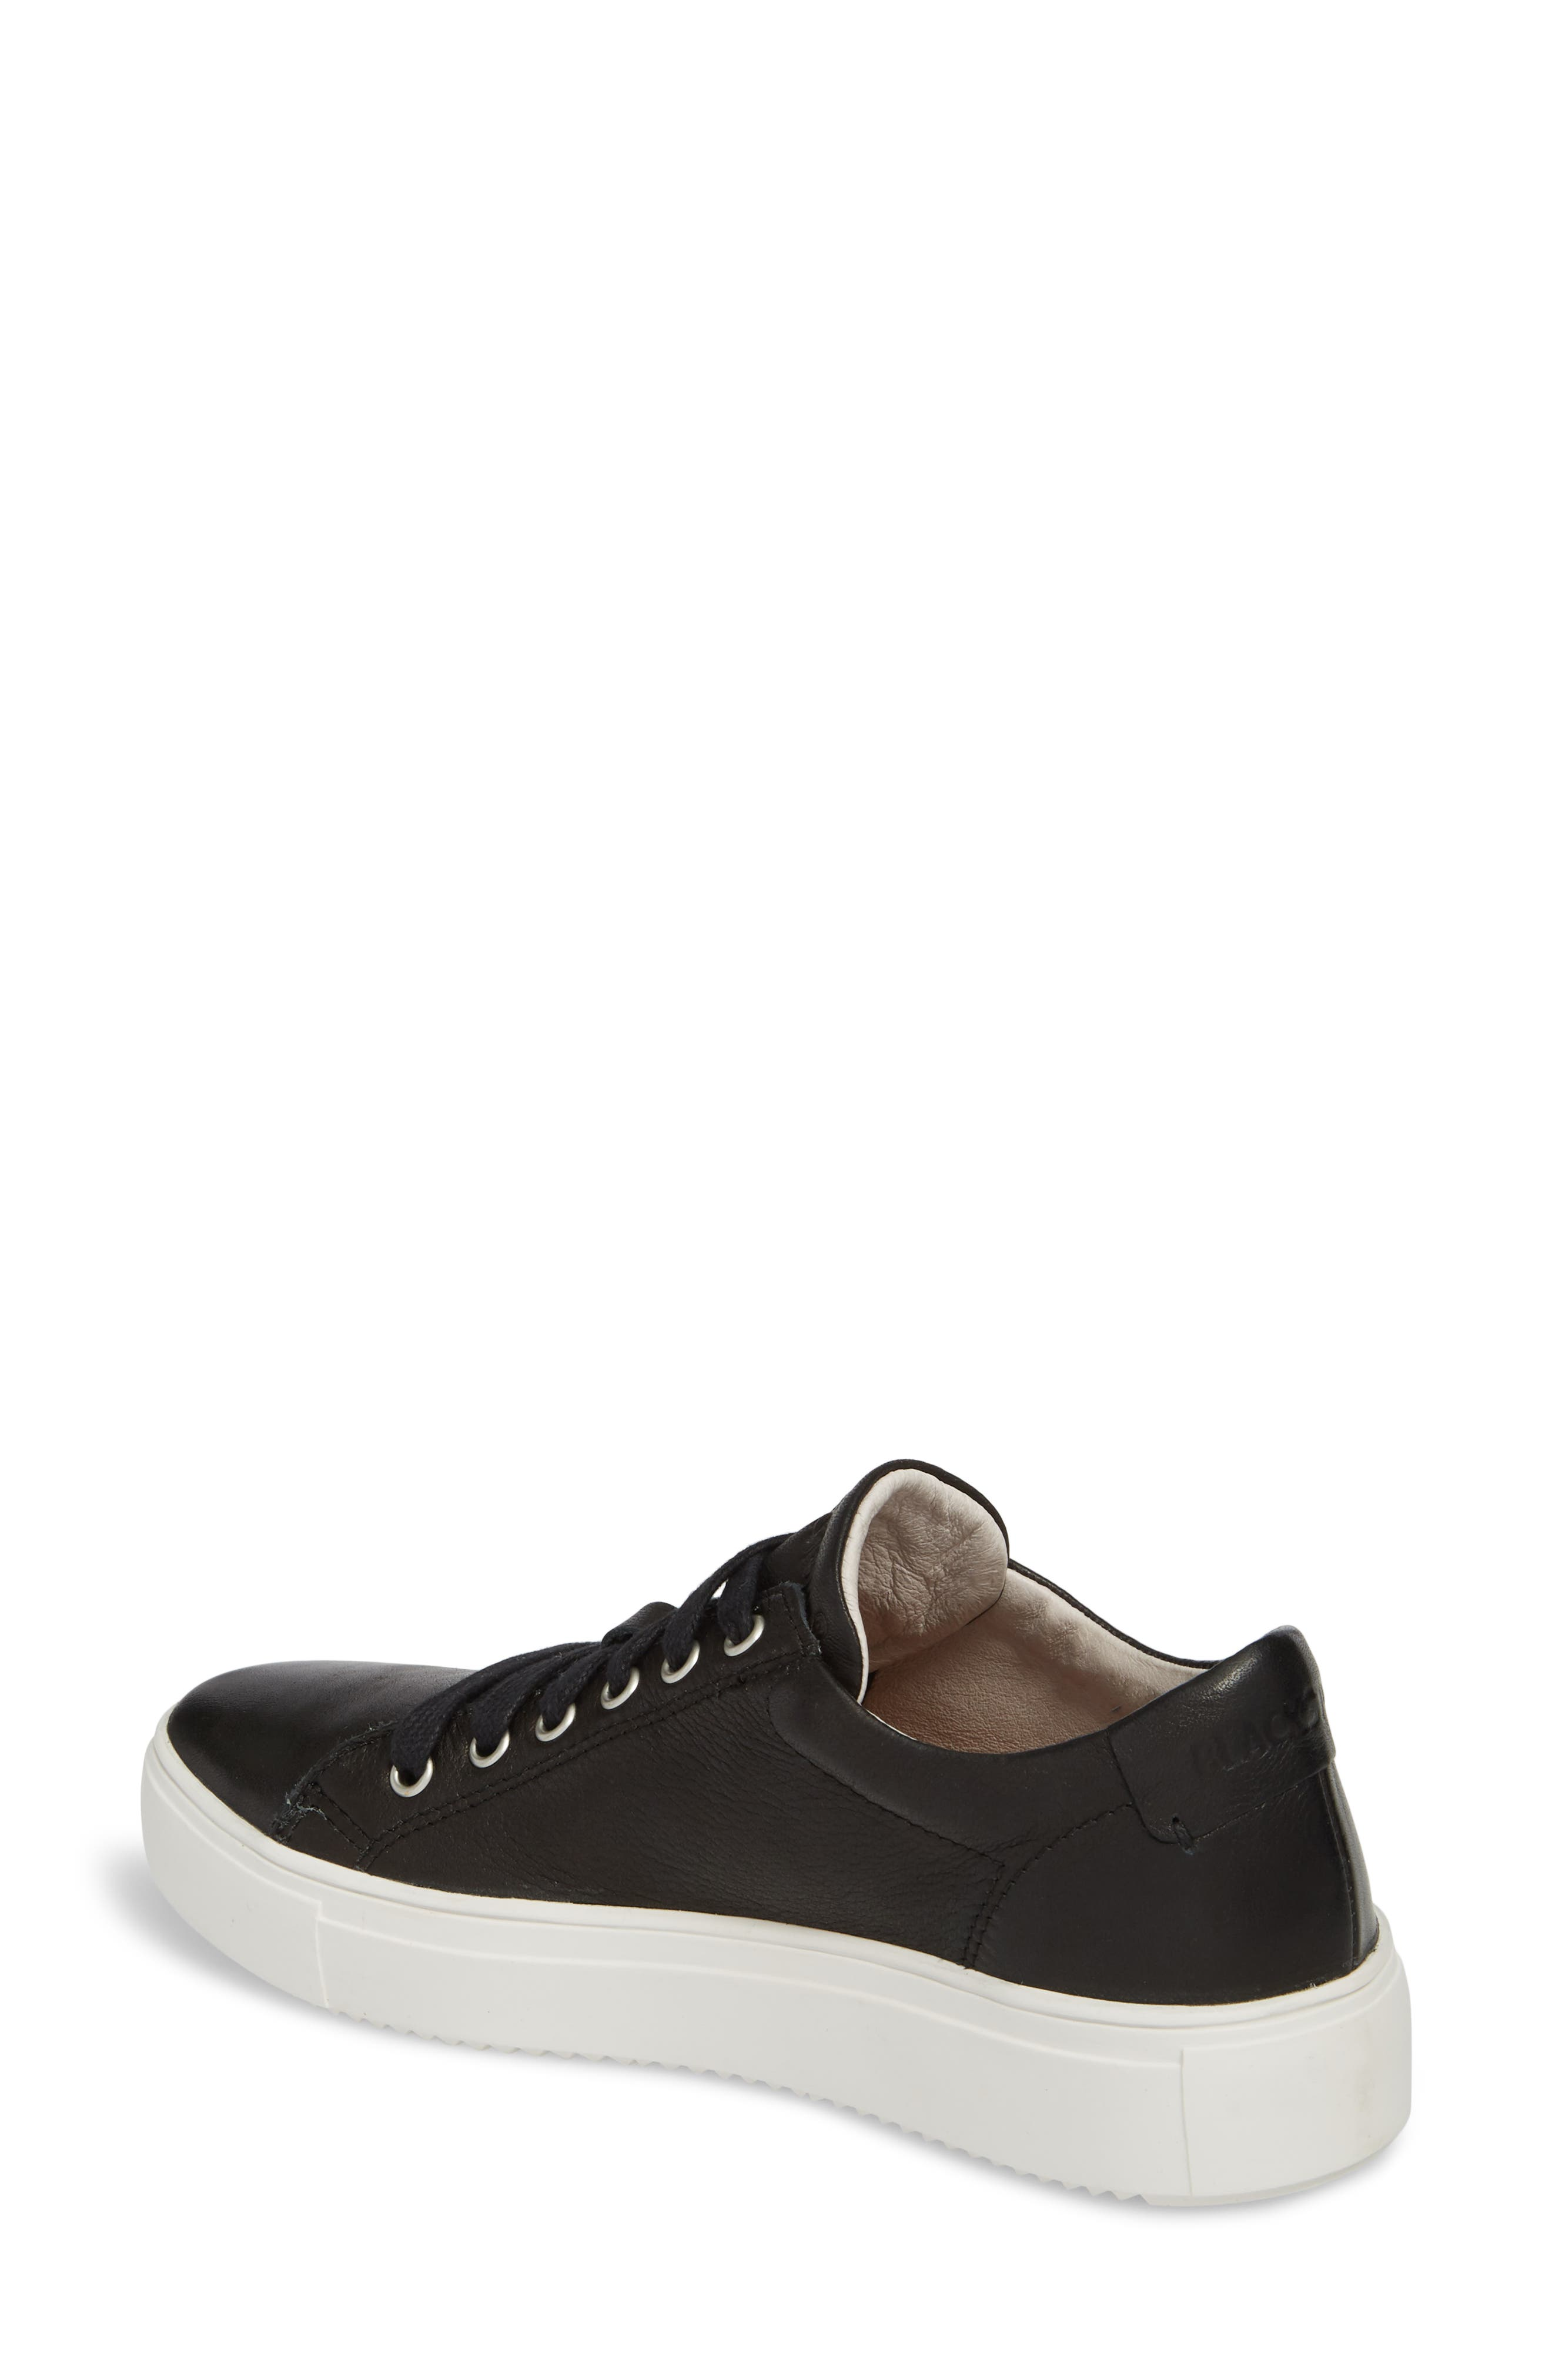 PL71 Low Top Sneaker,                             Alternate thumbnail 2, color,                             BLACK LEATHER